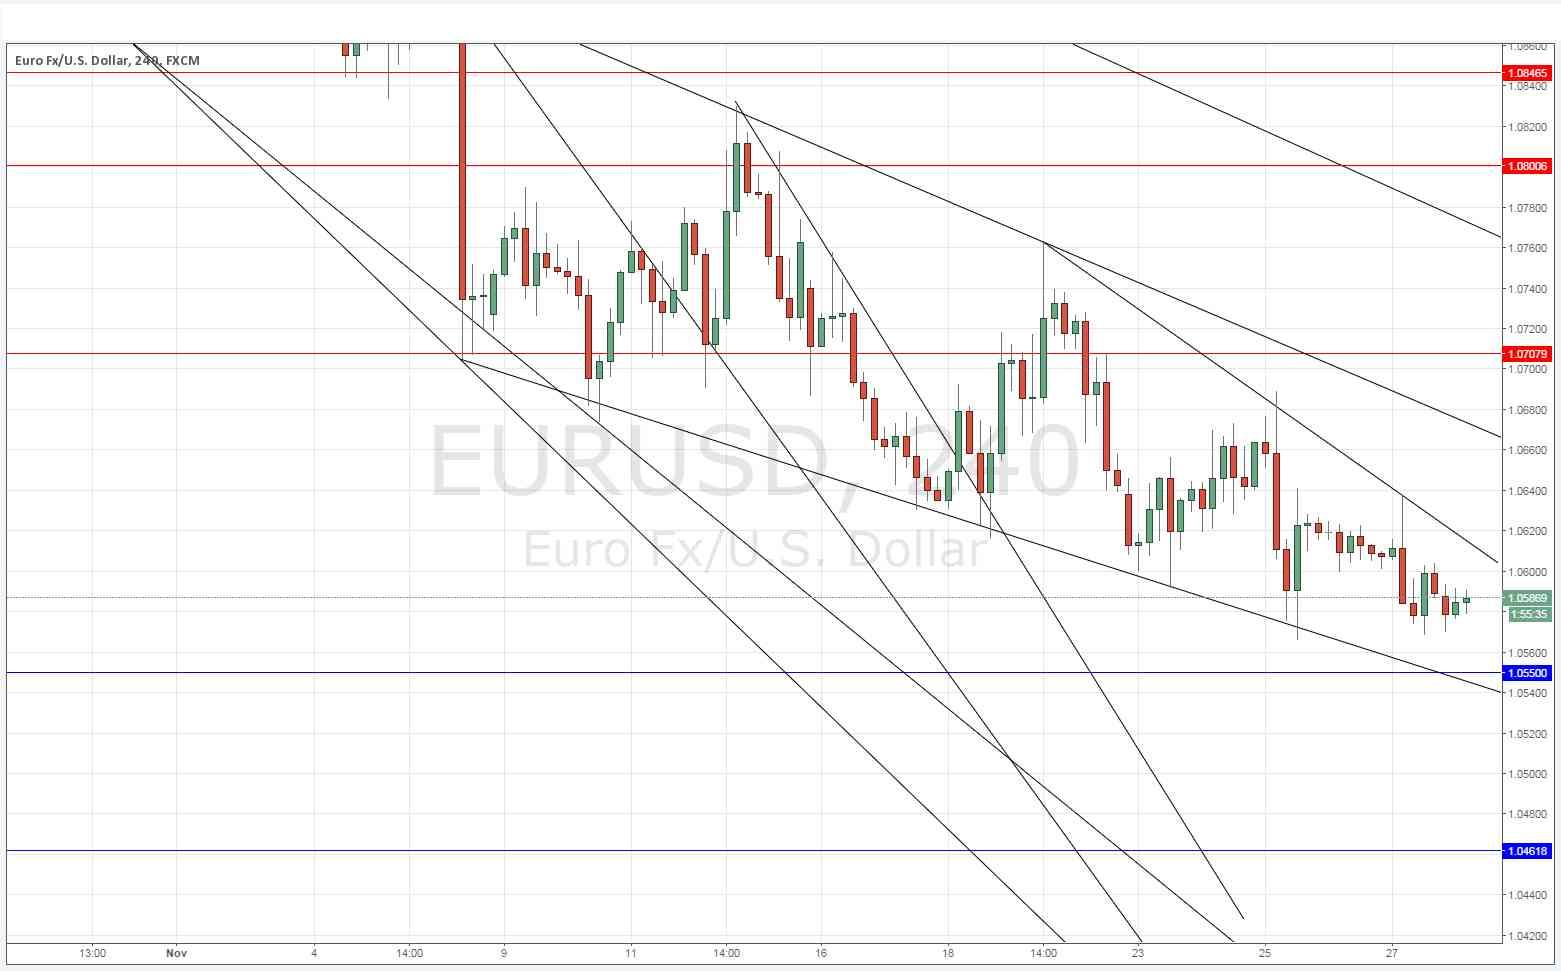 Signal forex eur/usd